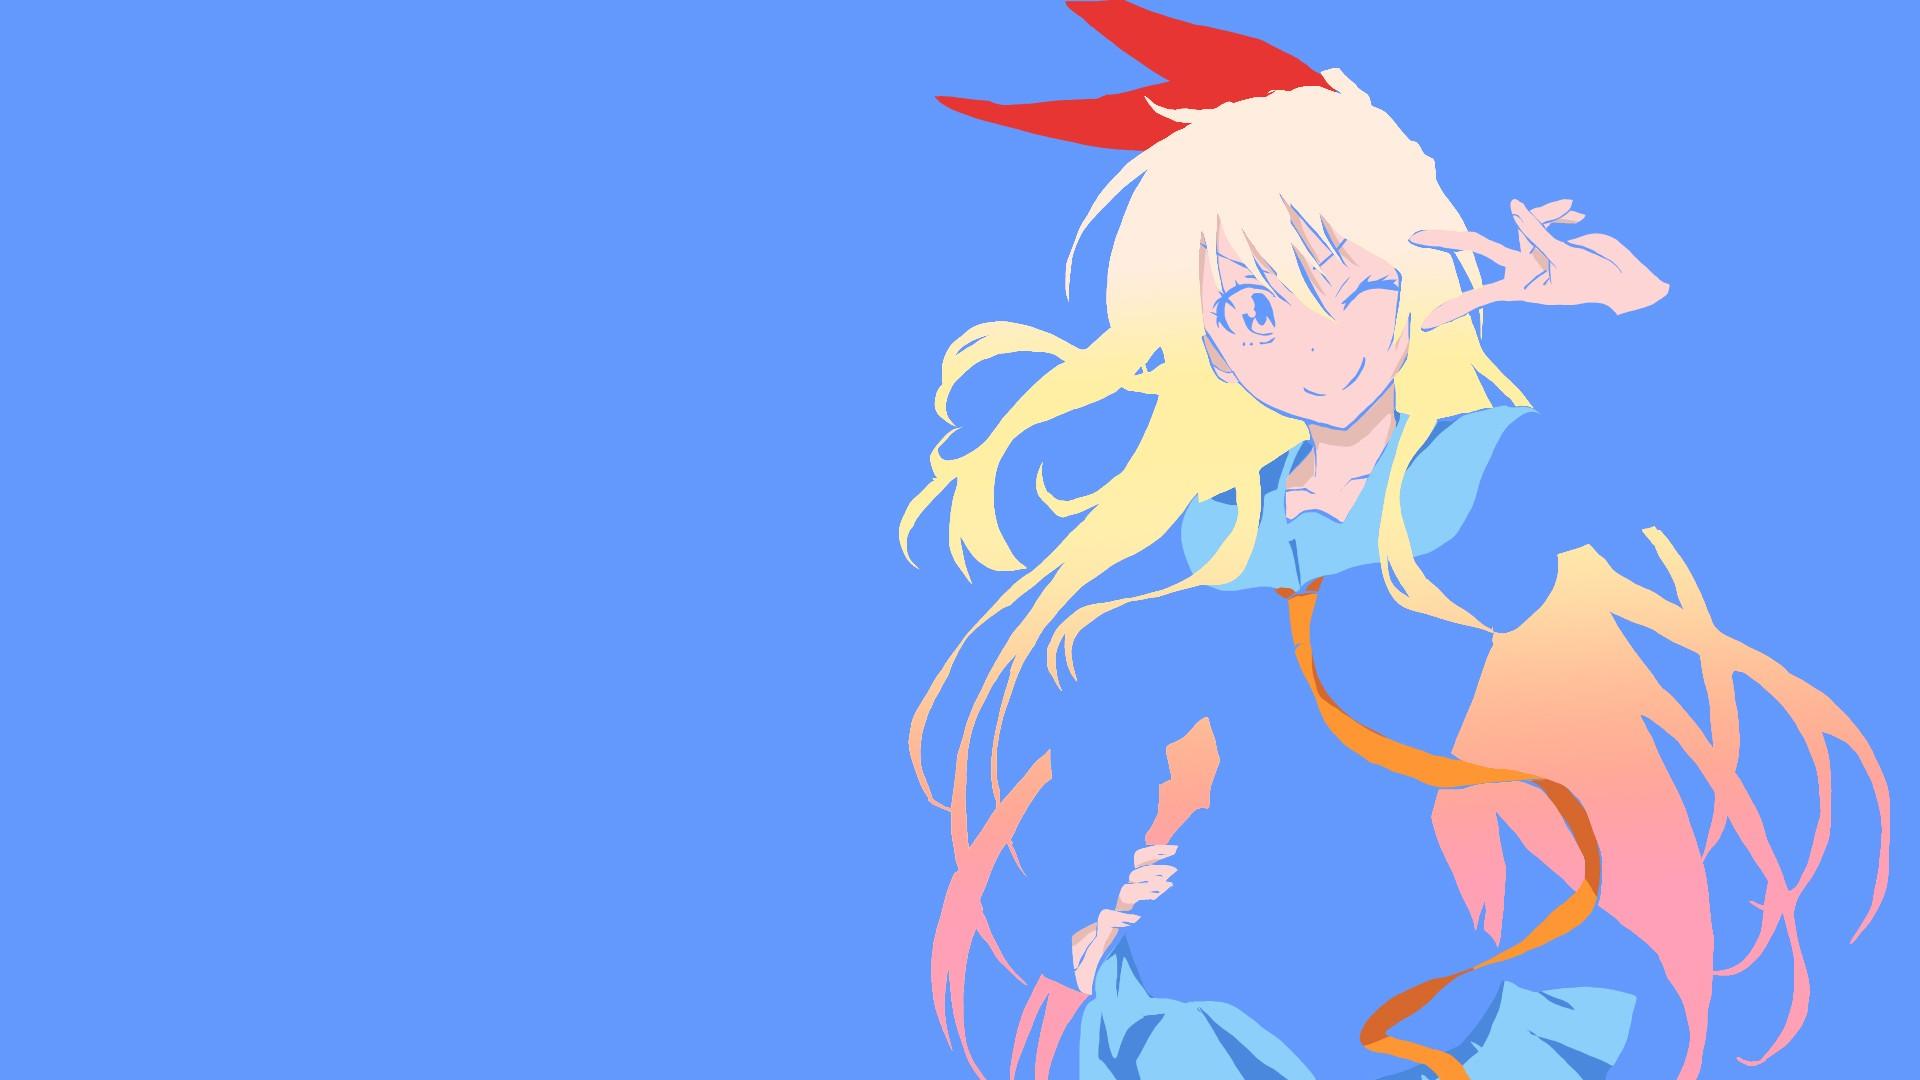 Illustration Anime Girls Cartoon Nisekoi Kirisaki Chitoge Fictional Character